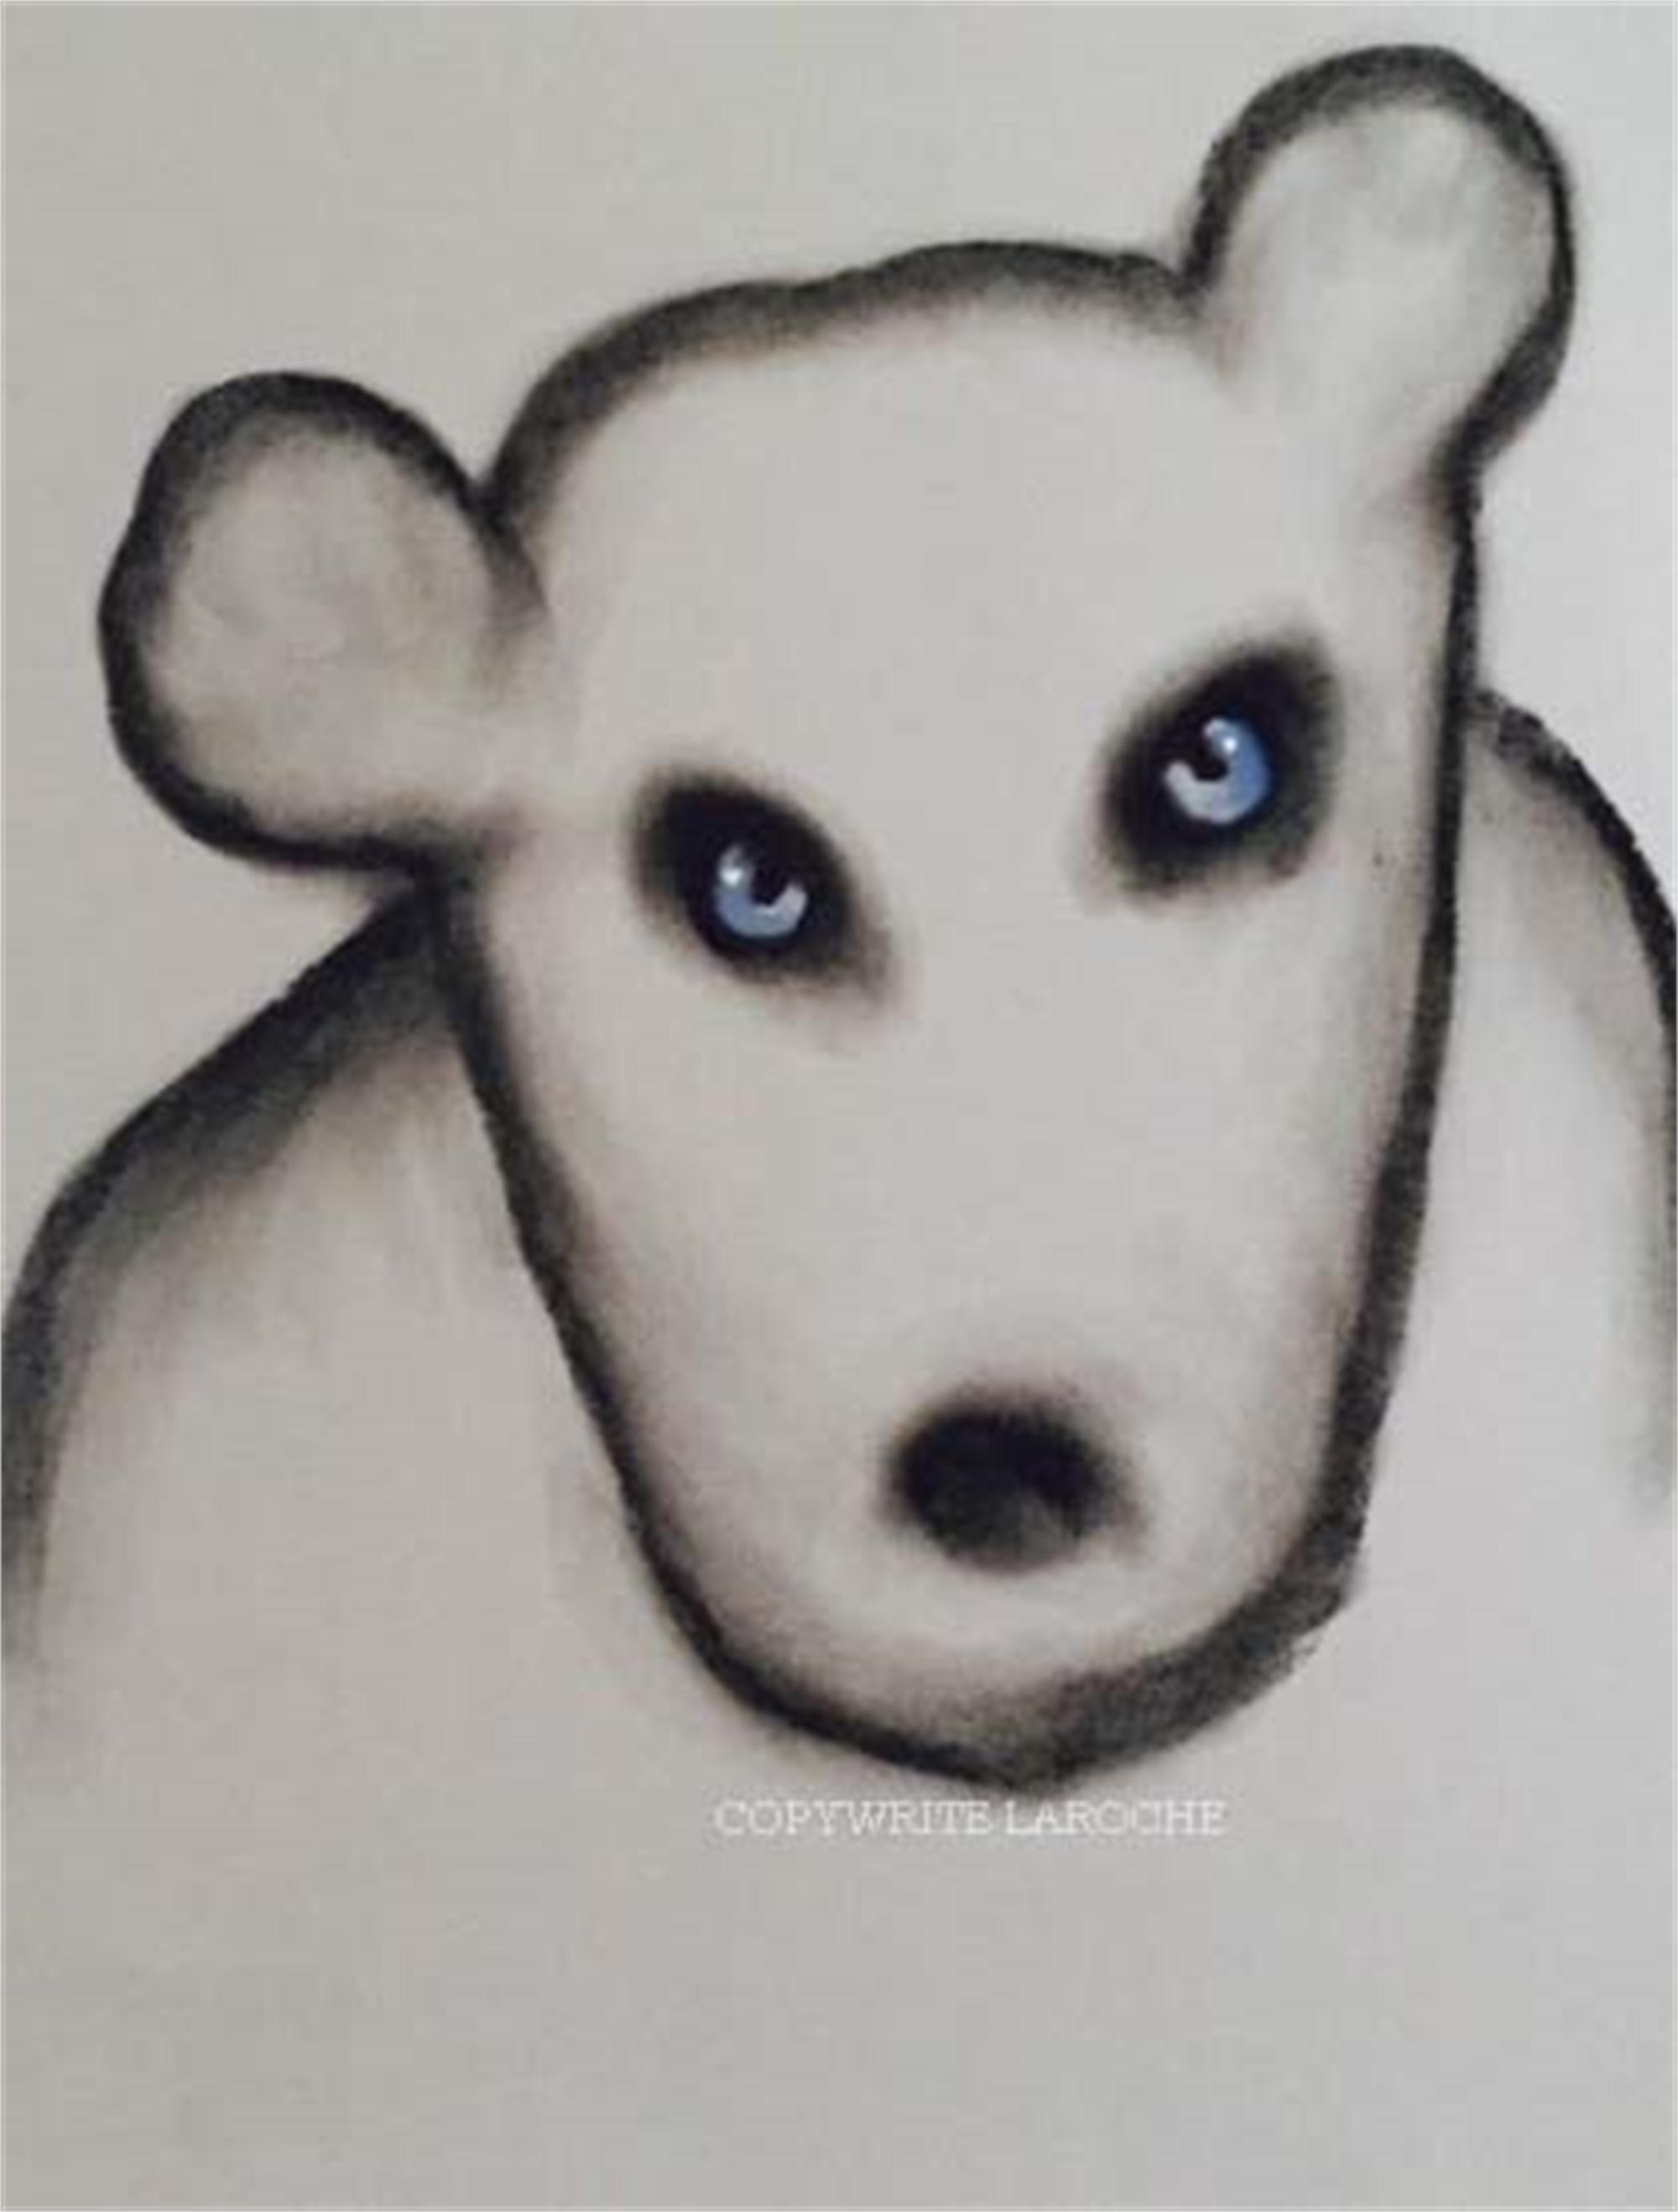 THE VISITORS/BEAR V by Carole LaRoche